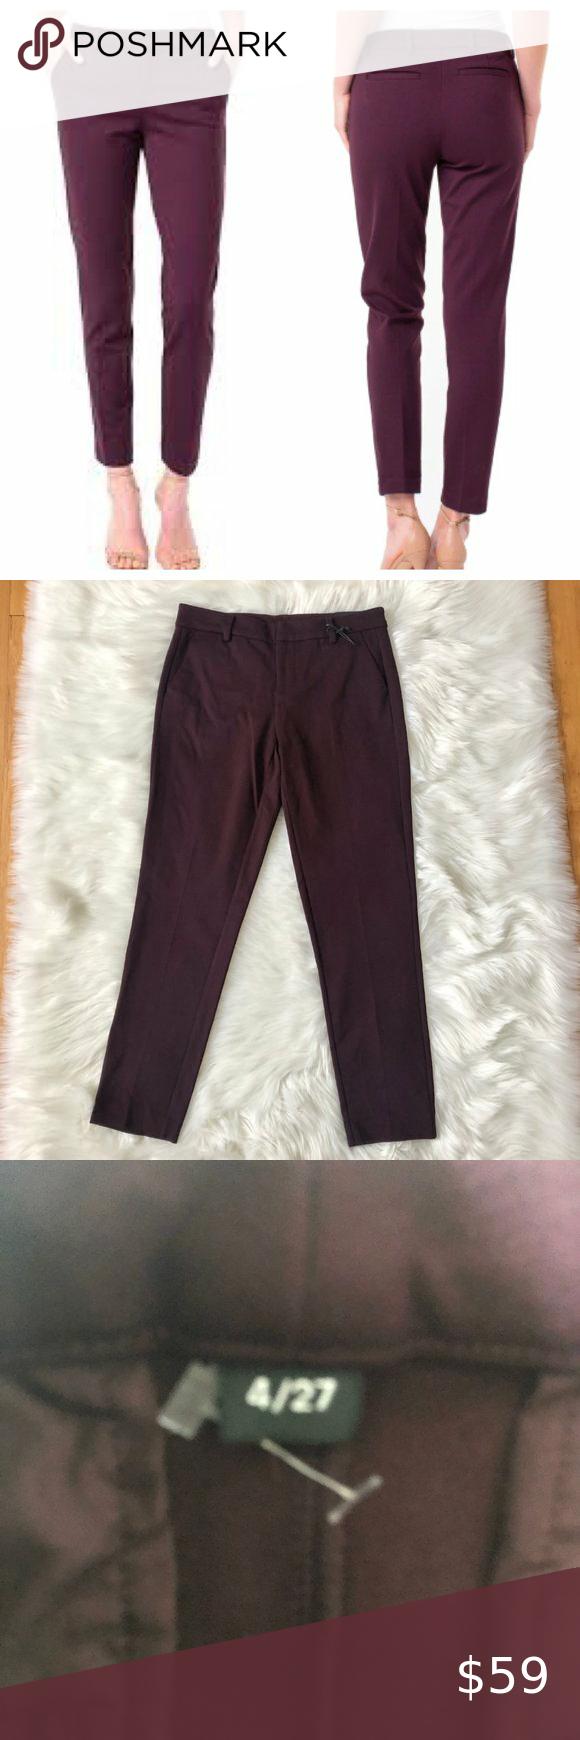 Liverpool Stitch Fix Kelsey Knit Trouser Nwt 4 27 In 2020 Stylish Pants Stitch Fix Brands Liverpool Jeans